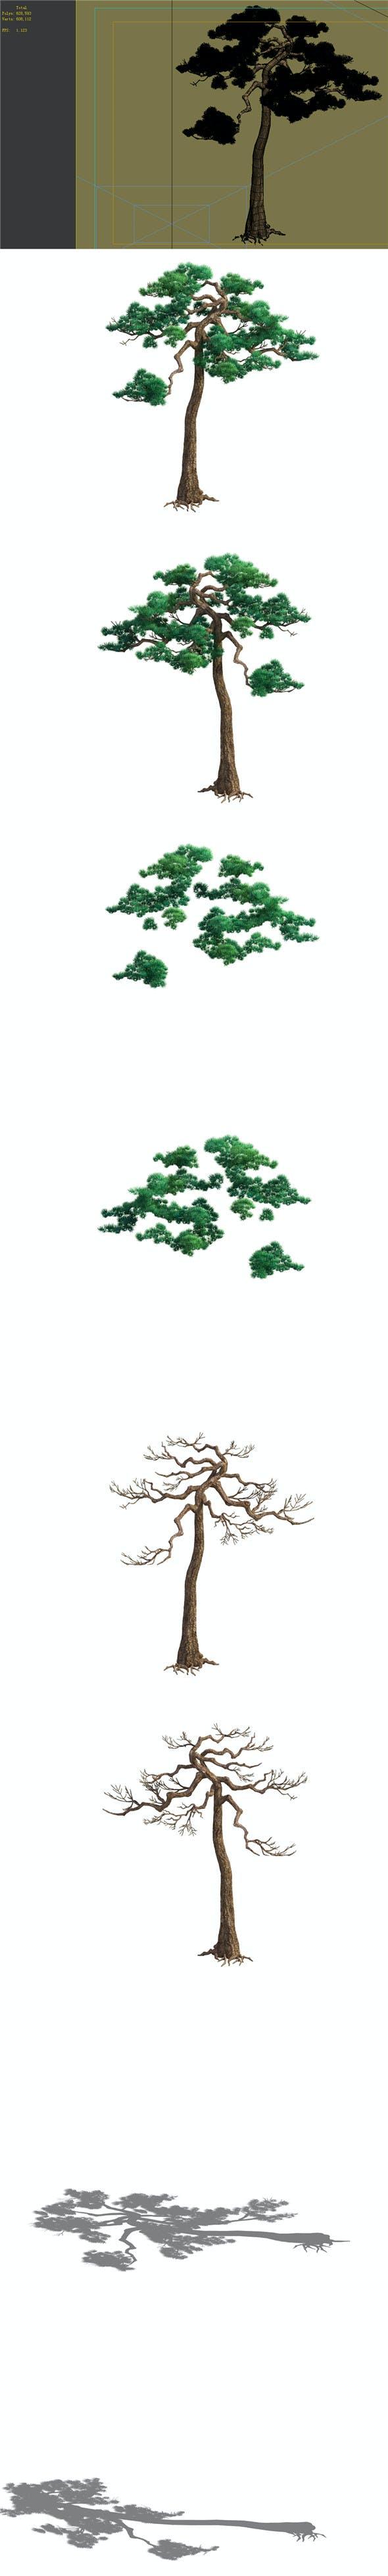 Game Model - Taoist comprehension scene - Pine 08 01 - 3DOcean Item for Sale